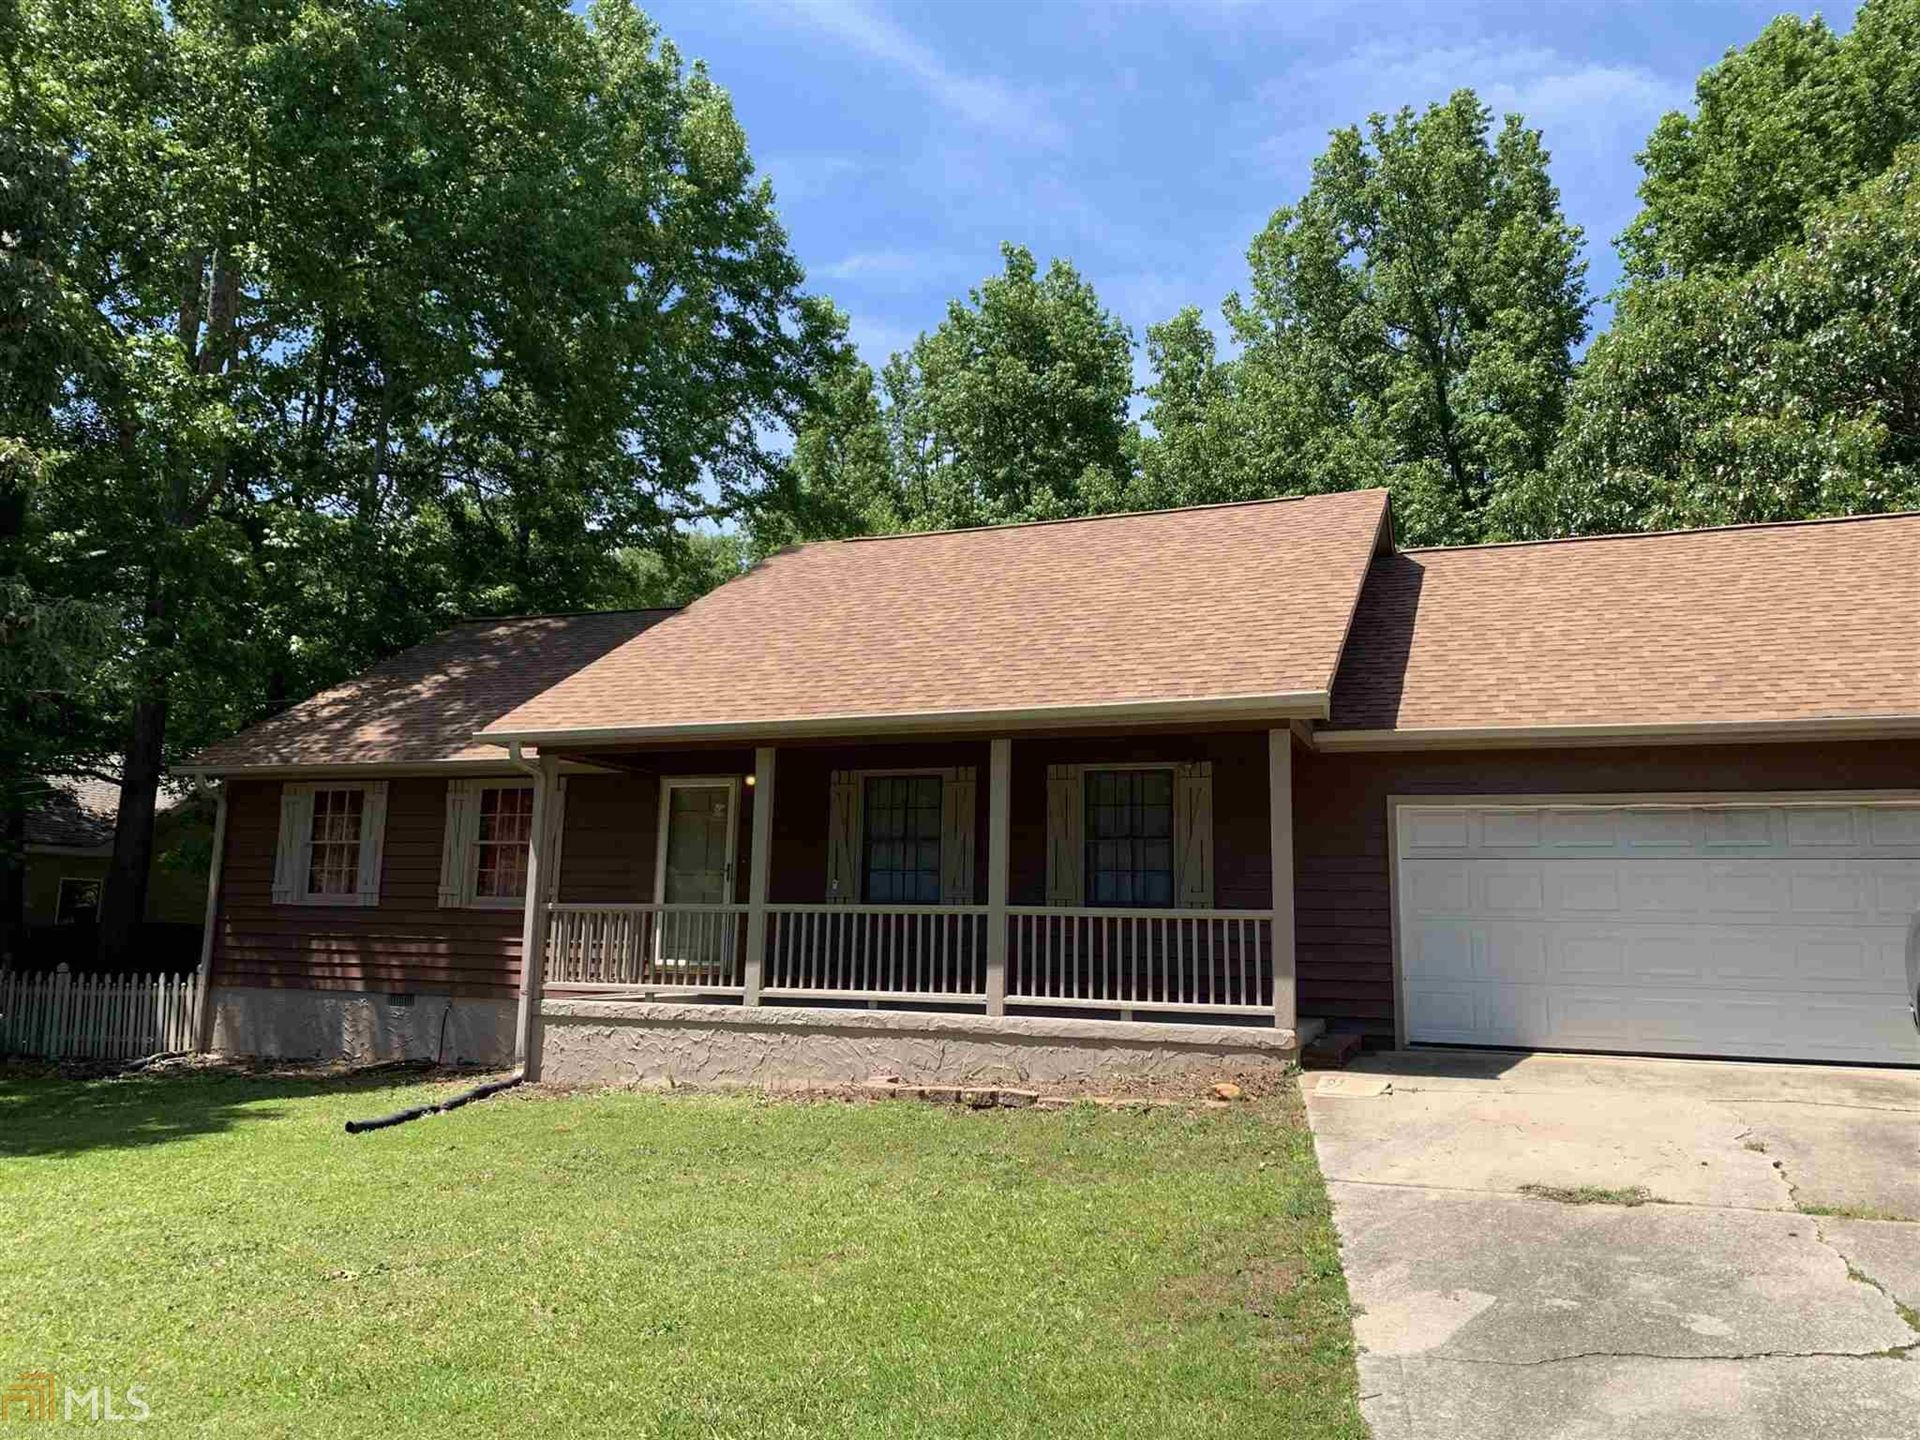 Photo of 215 Winston Drive, McDonough, GA 30252 (MLS # 8975577)